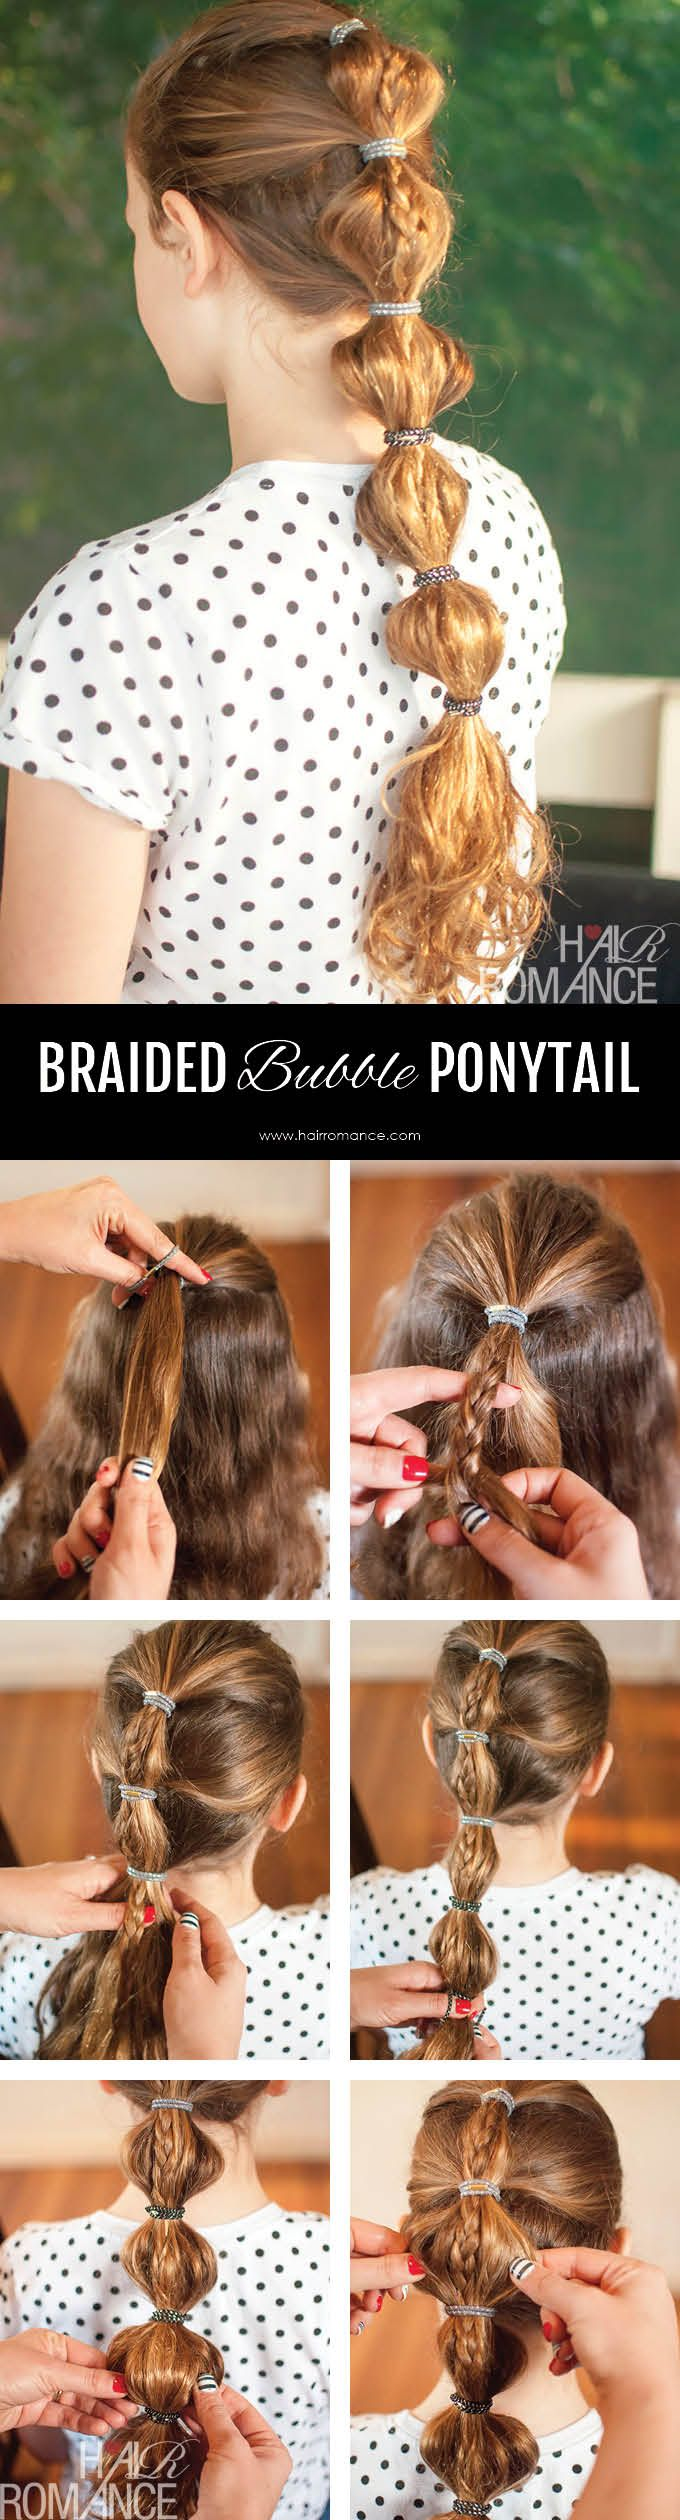 Hair Romance - easy school hair - braided bubble ponytail tutorial